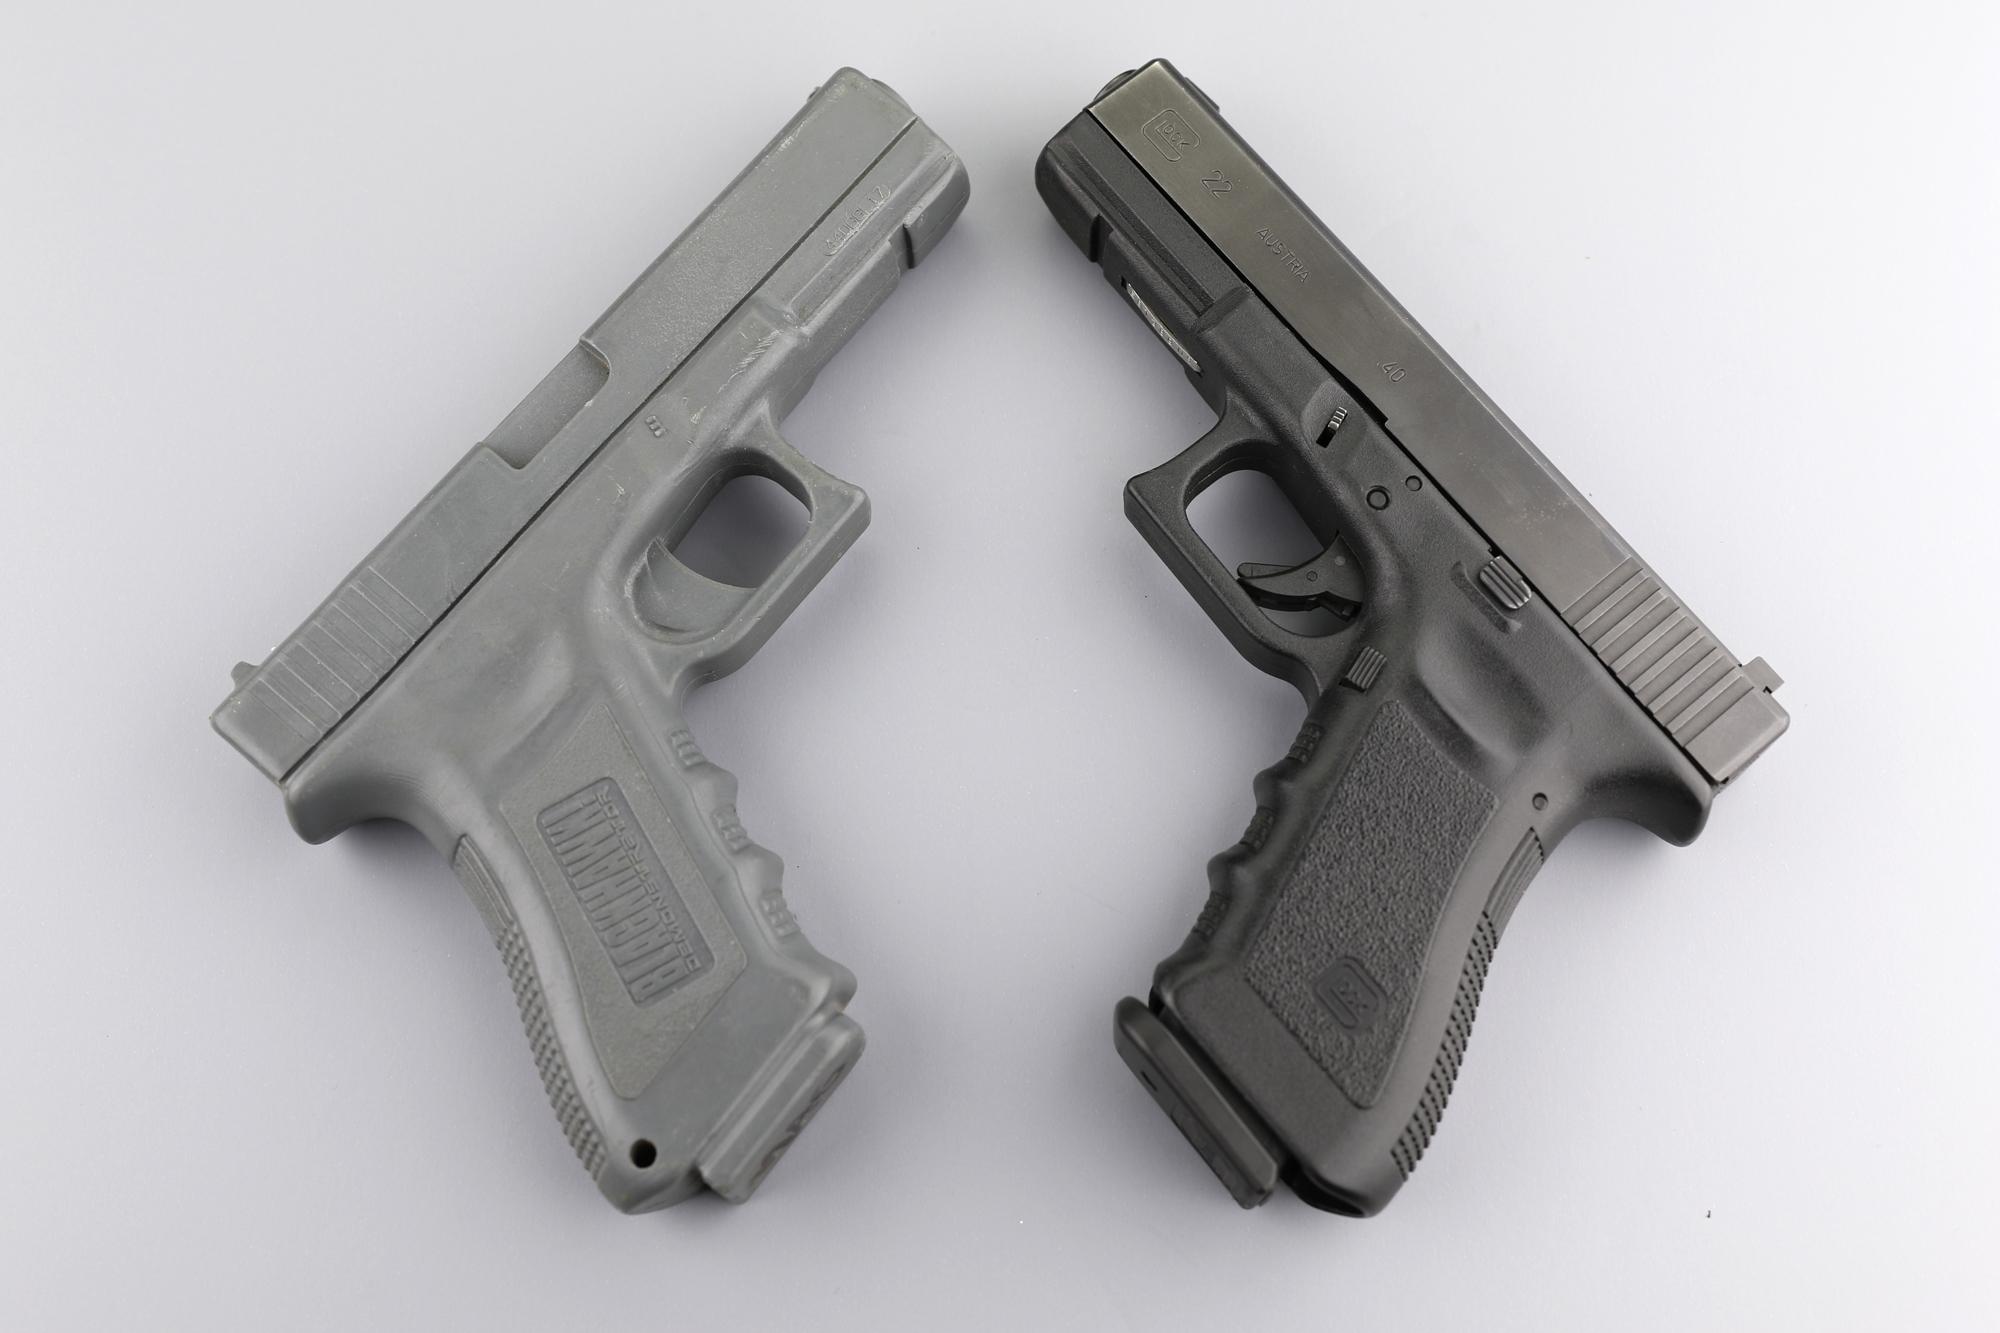 Glock 17 and Dummy Glock 17